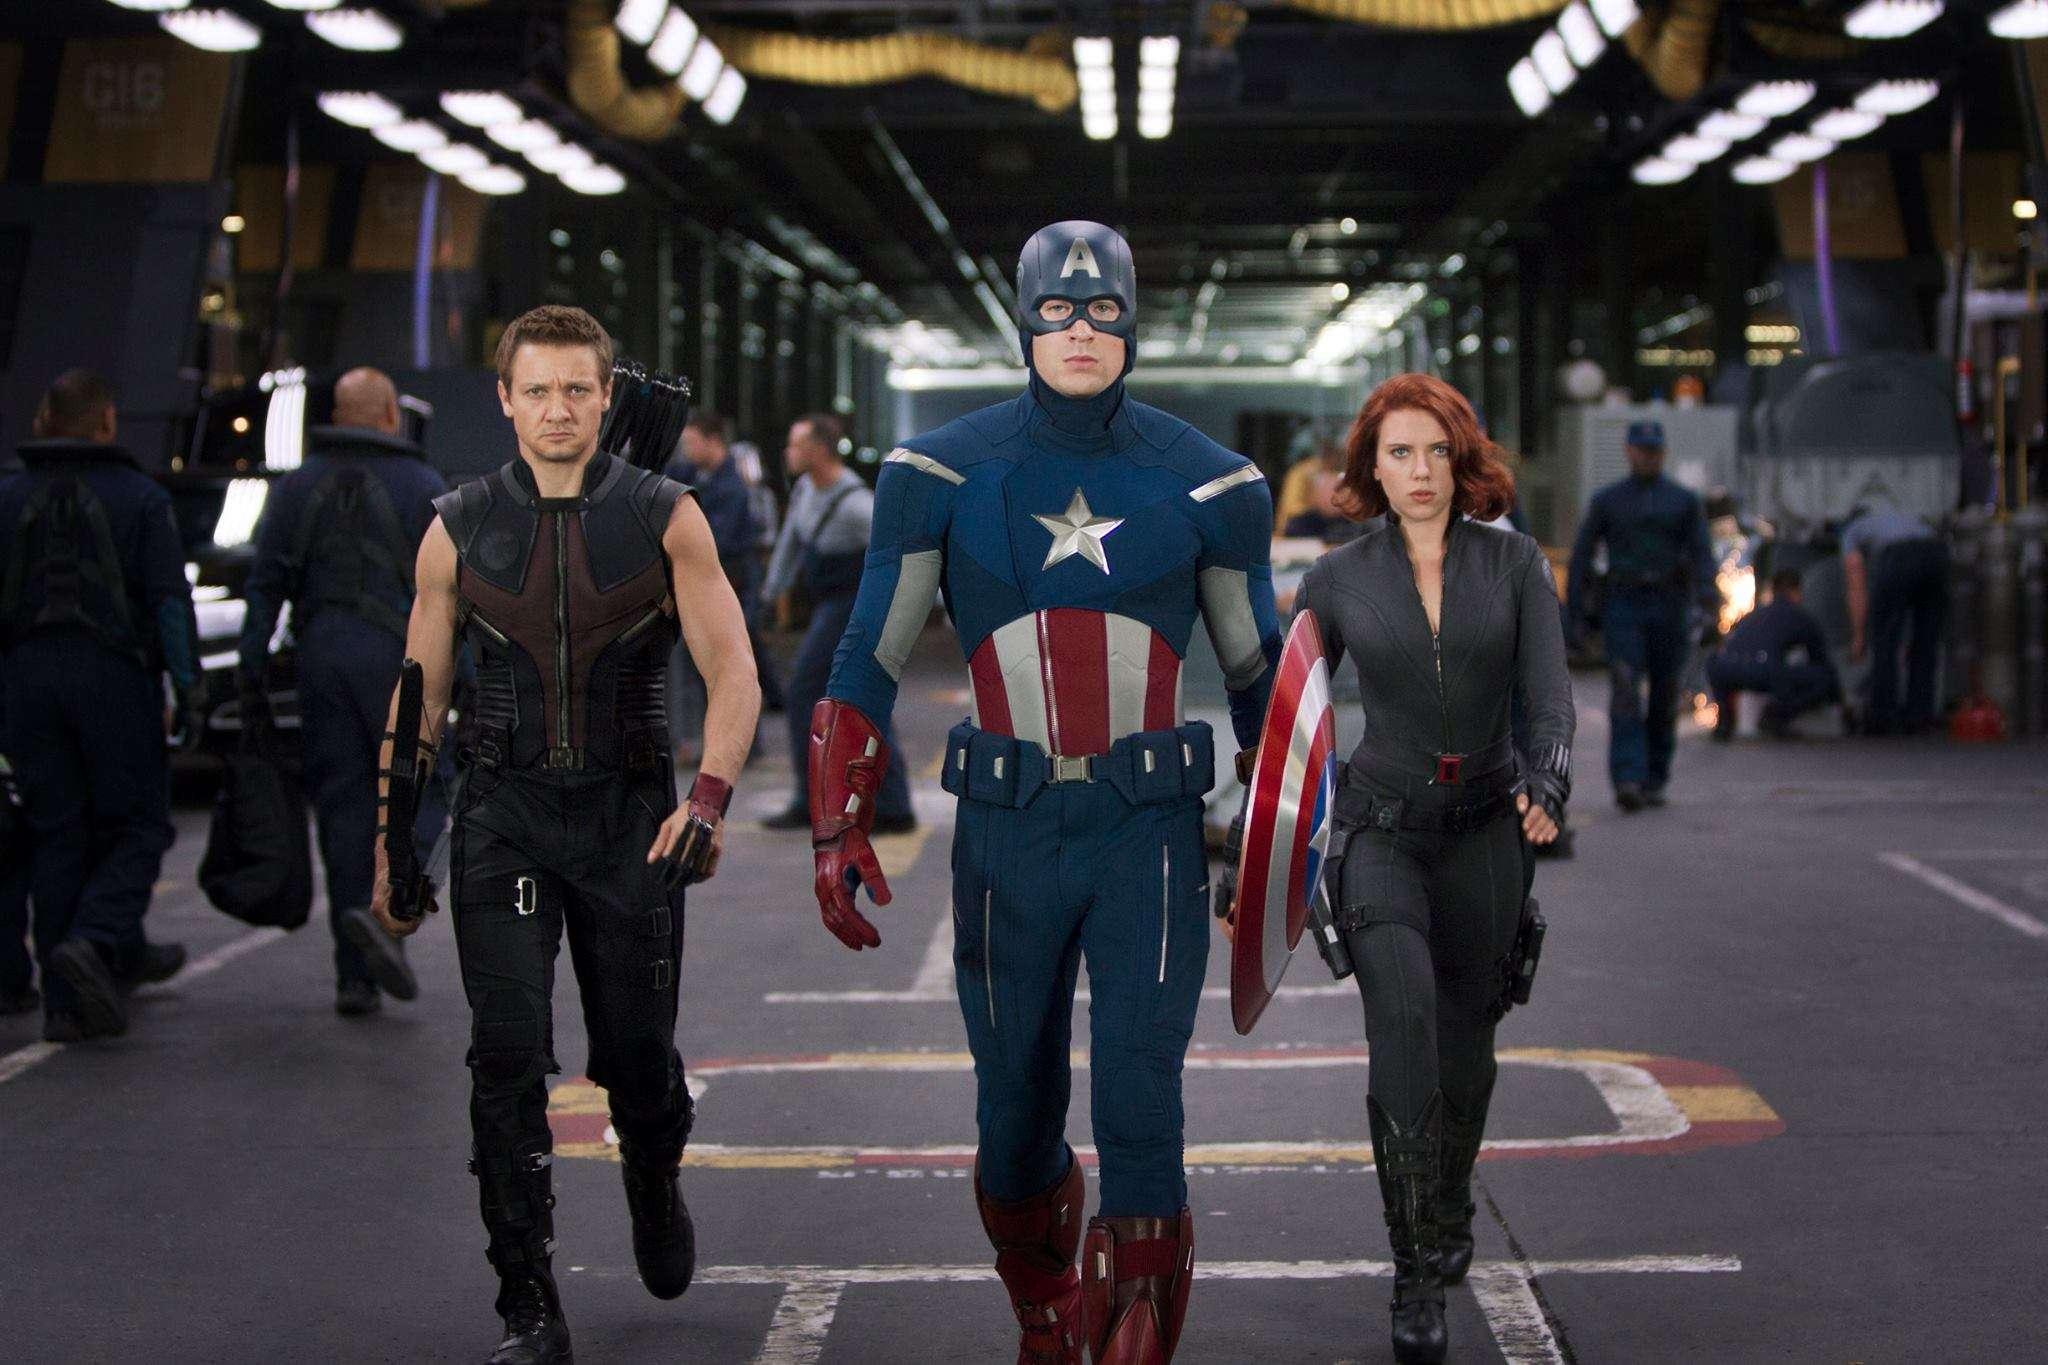 Imagen de 'The Avengers'. Foto: Avengers/Facebook